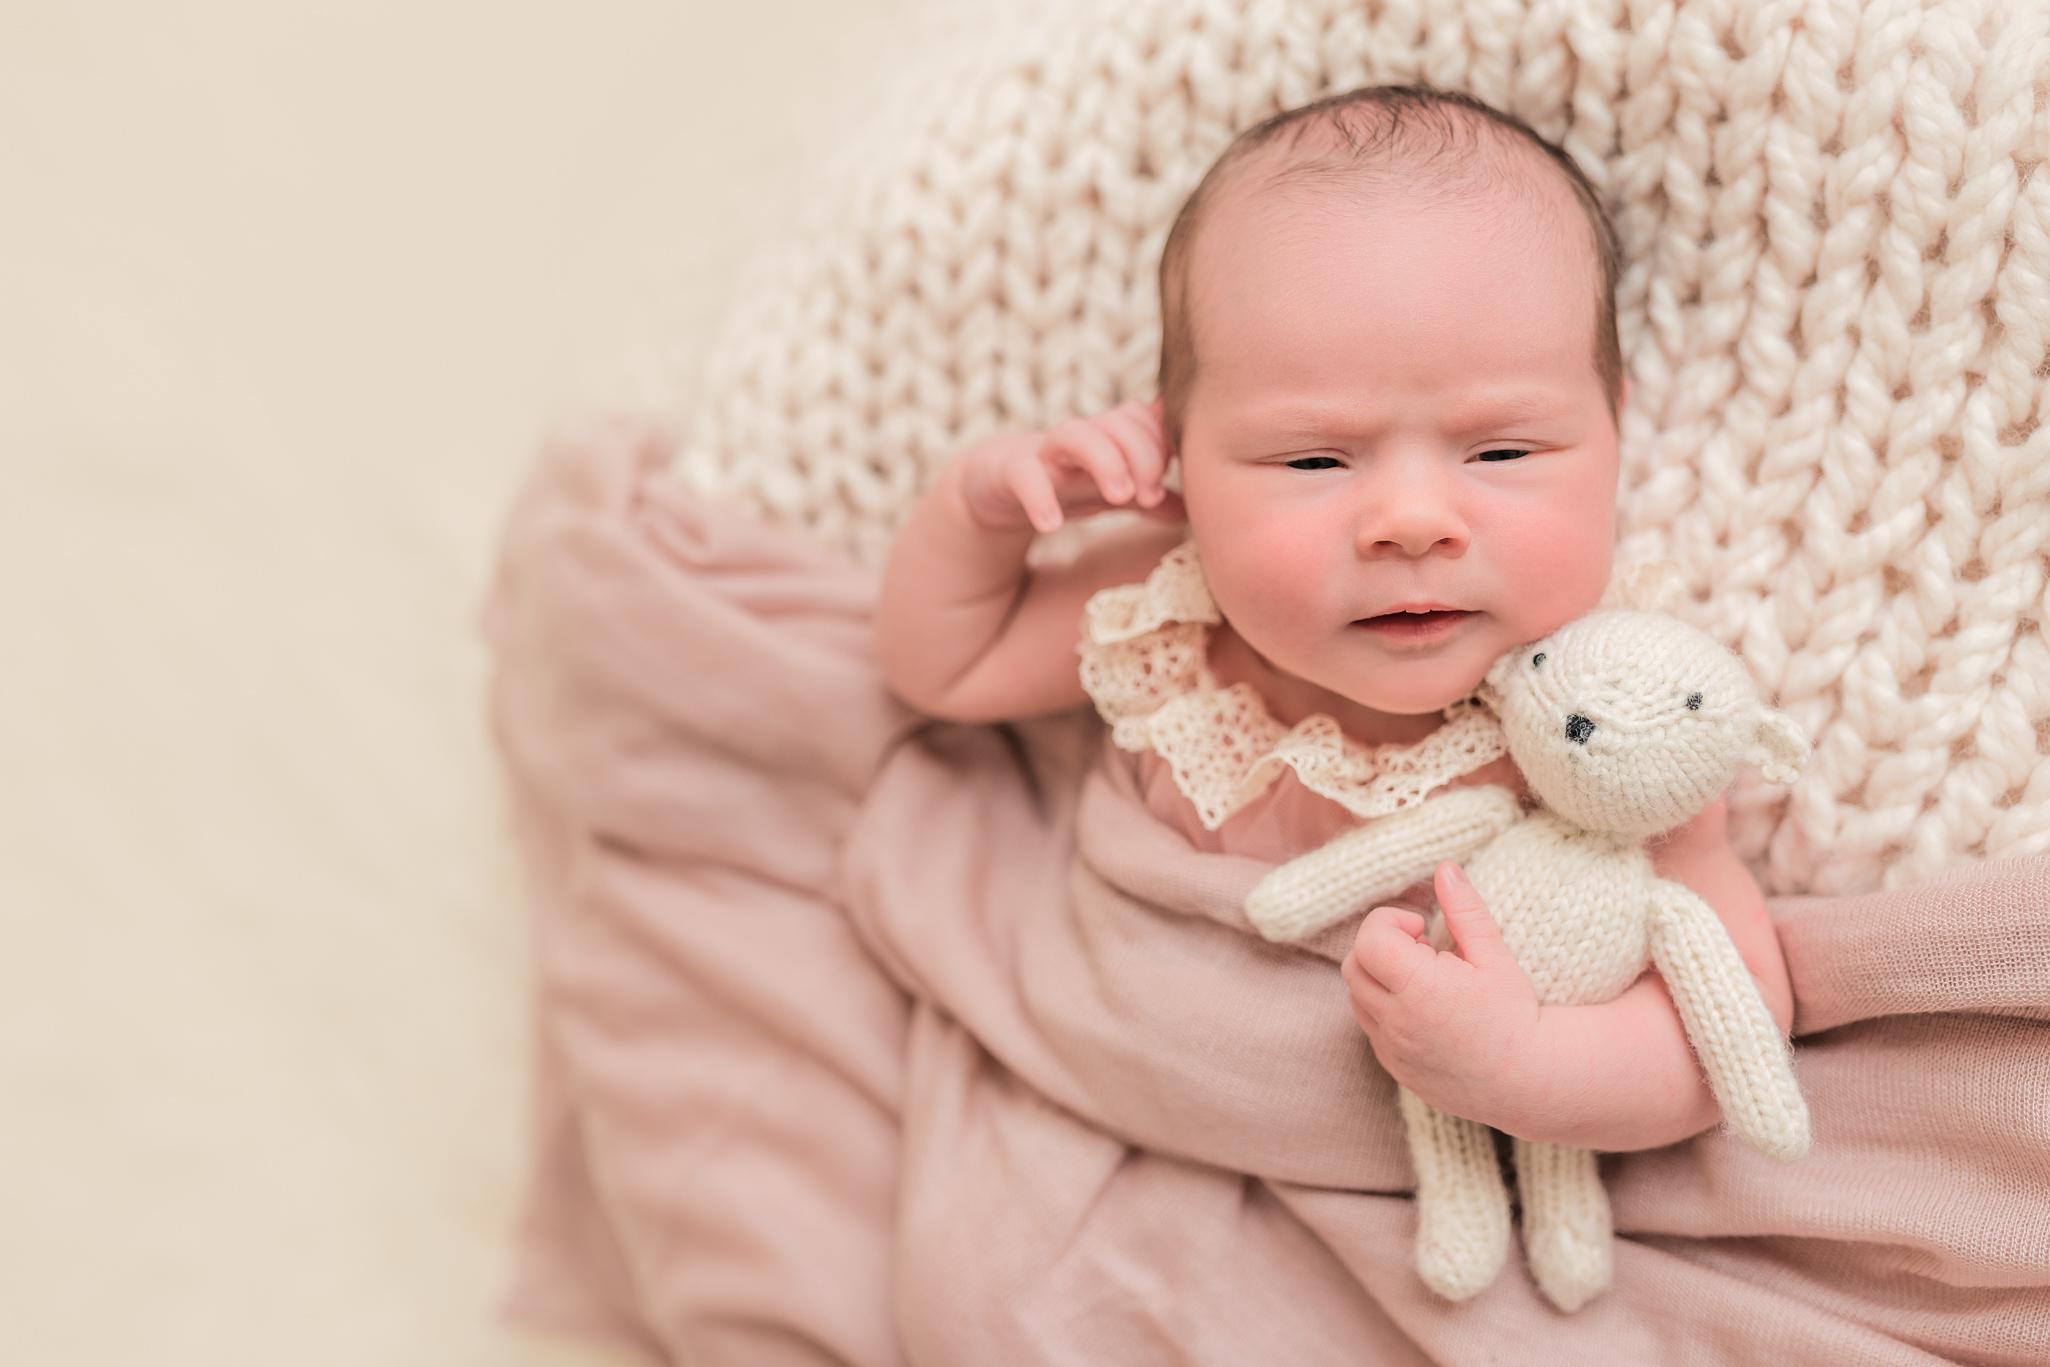 Lily_and_Lane_Victoria_BC_Newborn_Photographer-16.jpg